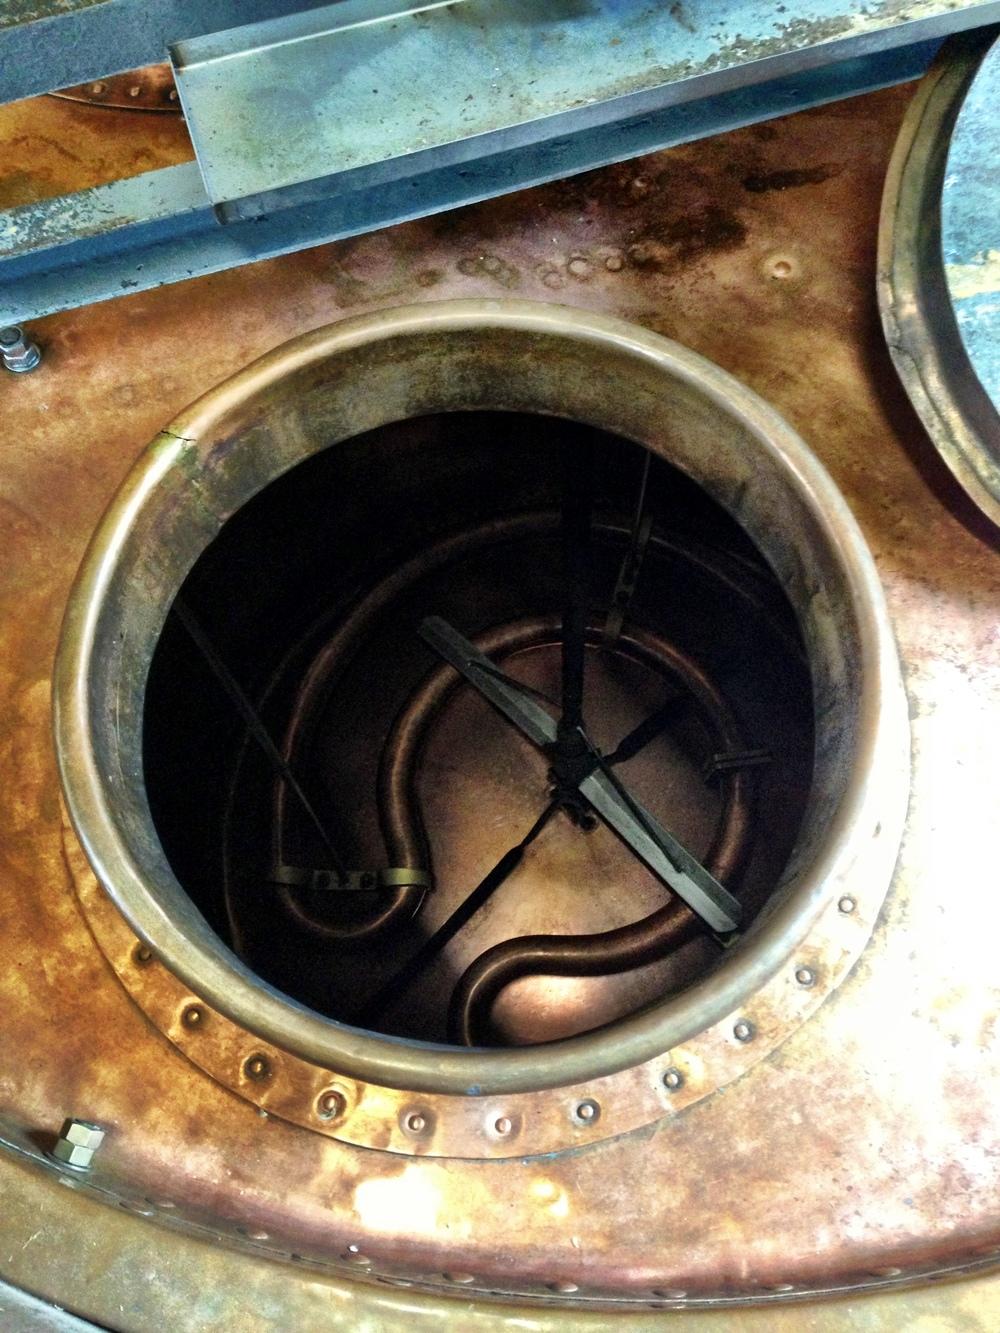 Boil kettle -Brasserie Cantillon Brouwerij